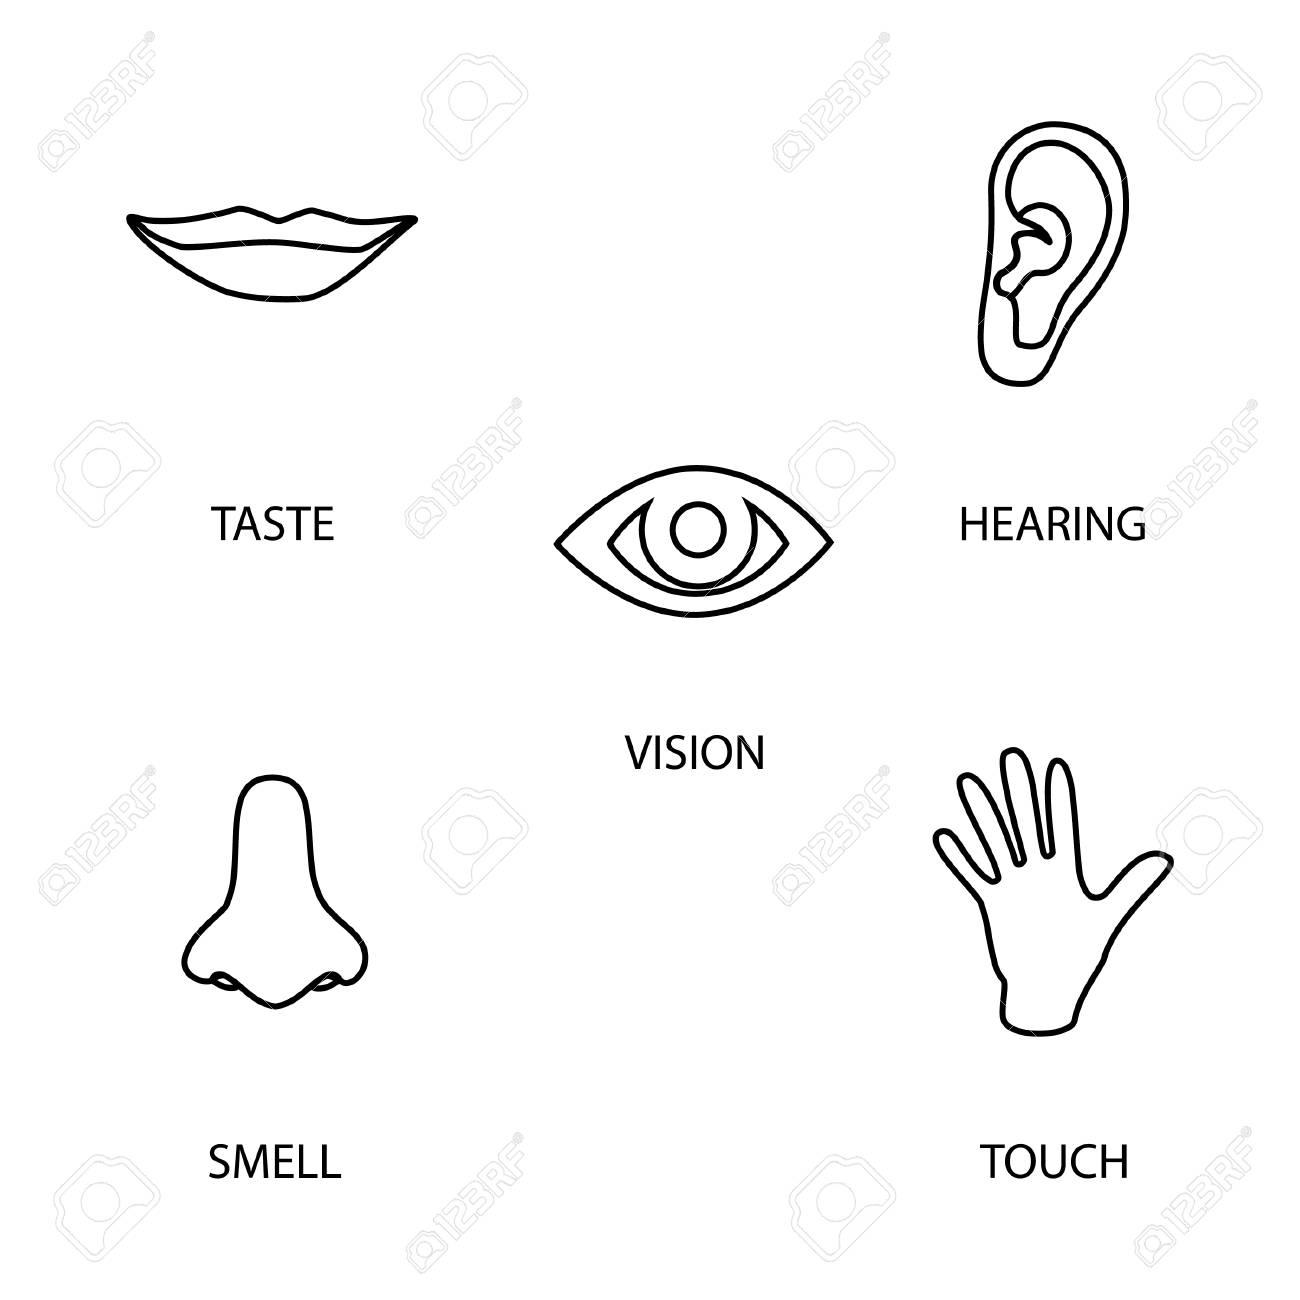 icon set of five human senses: vision (eye), smell (nose)